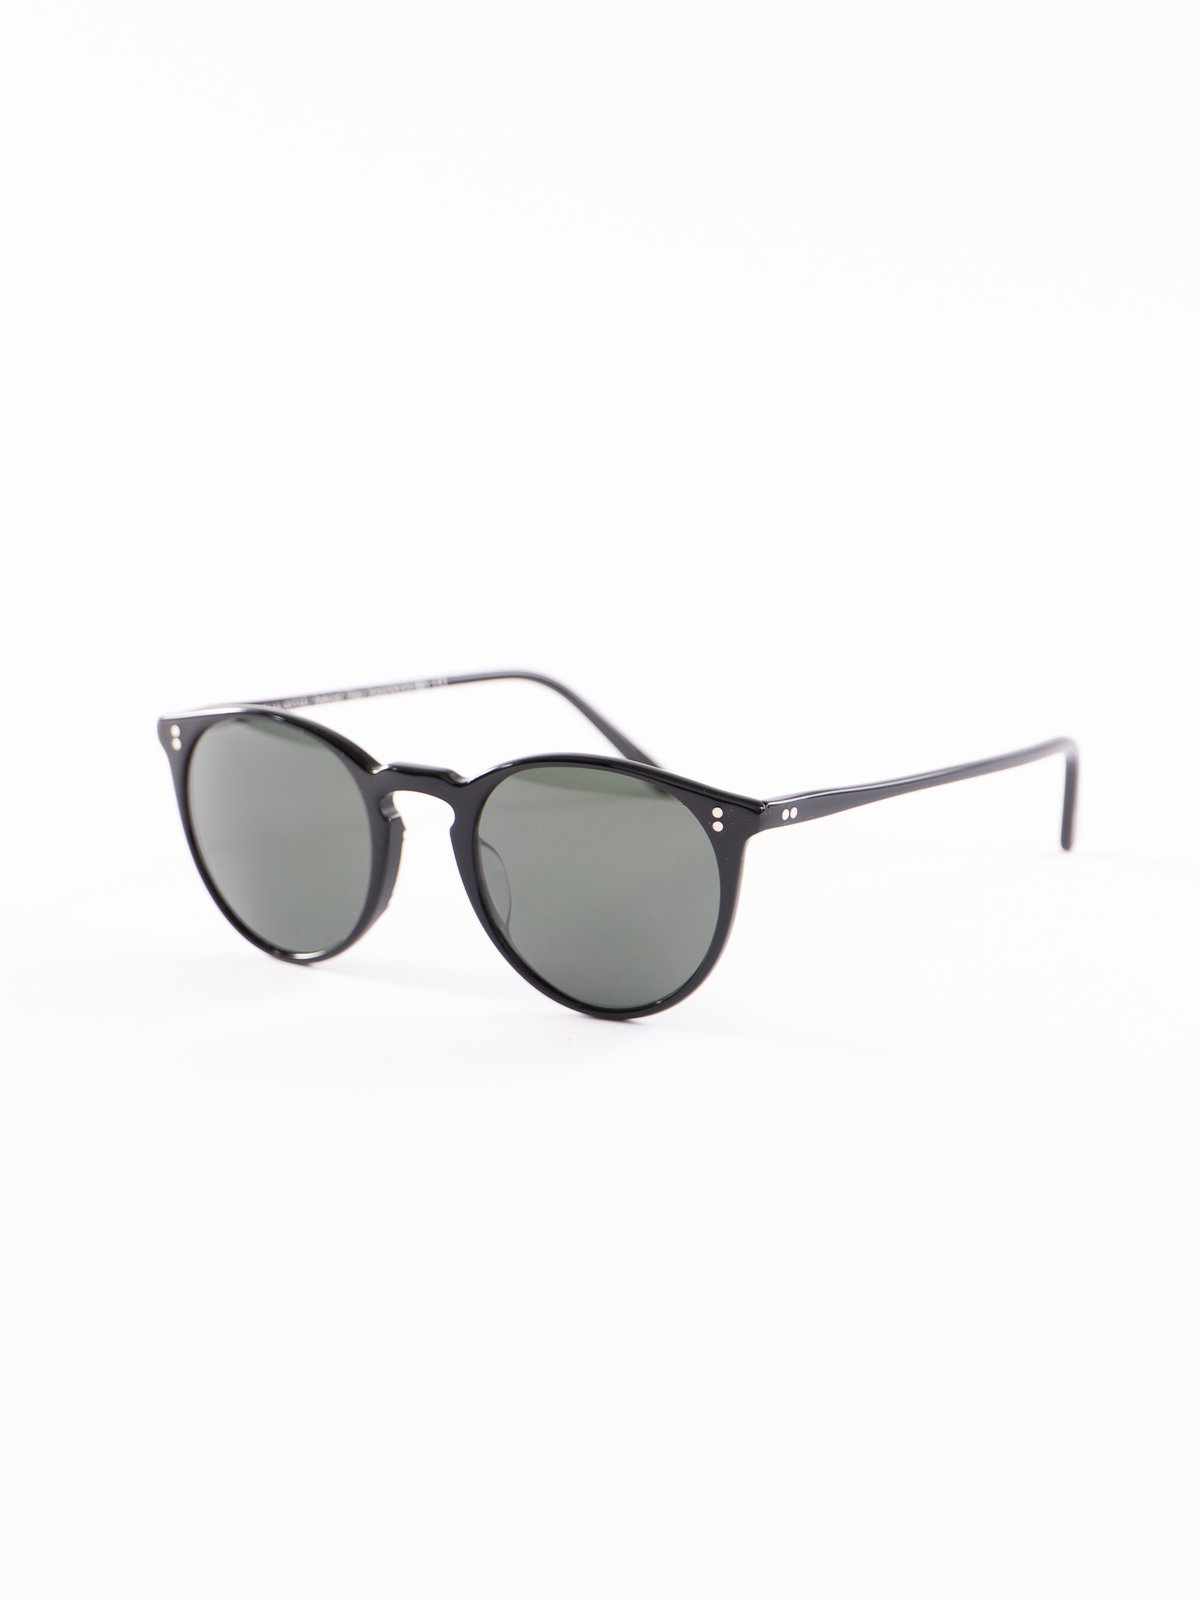 Black/Grey Polar O'Malley Sunglasses - Image 2